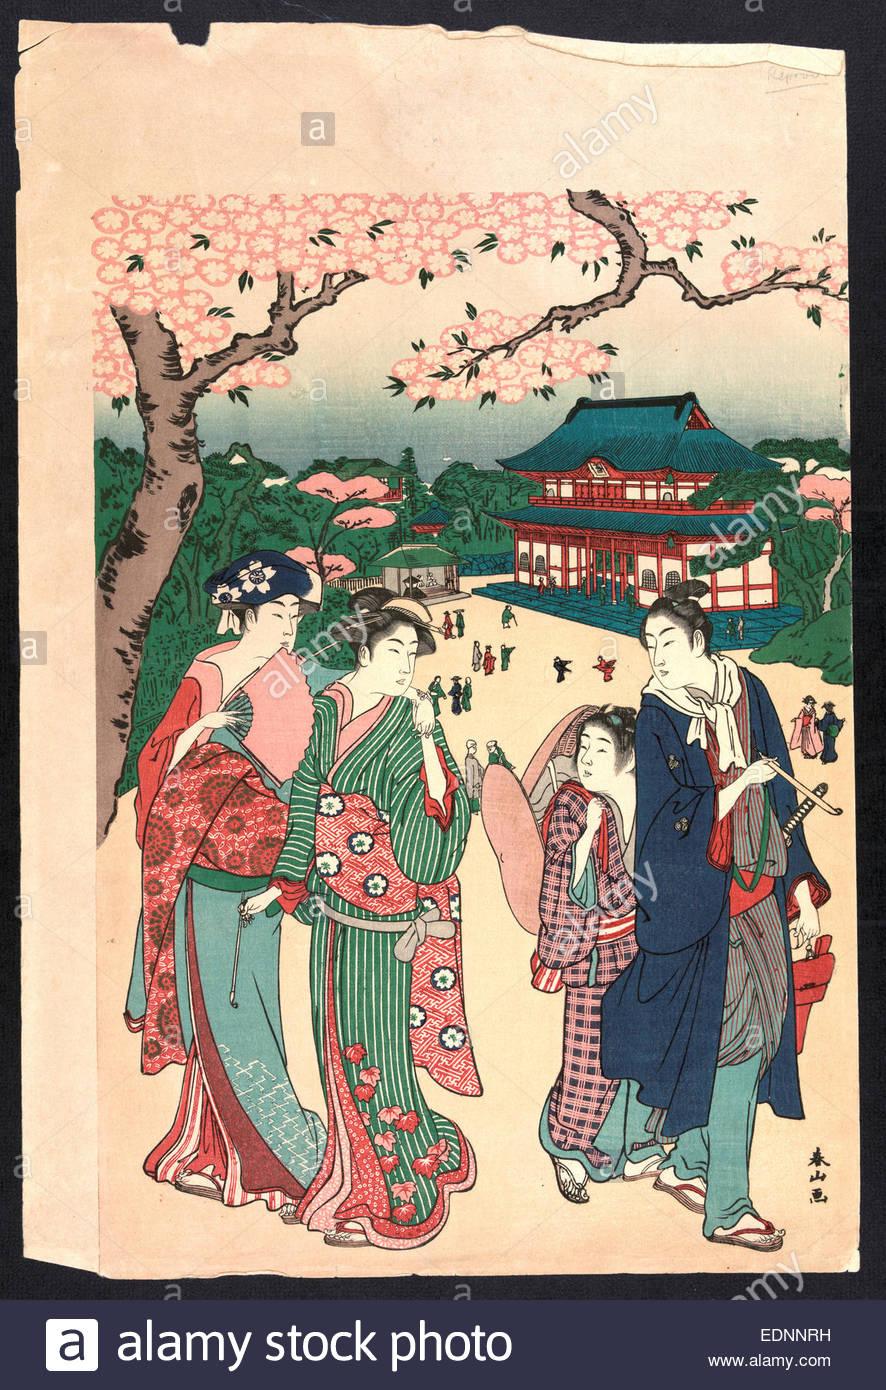 ueno-no-hanami-cherry-blossom-viewing-at-ueno-katsukawa-shunzan-active-EDNNRH